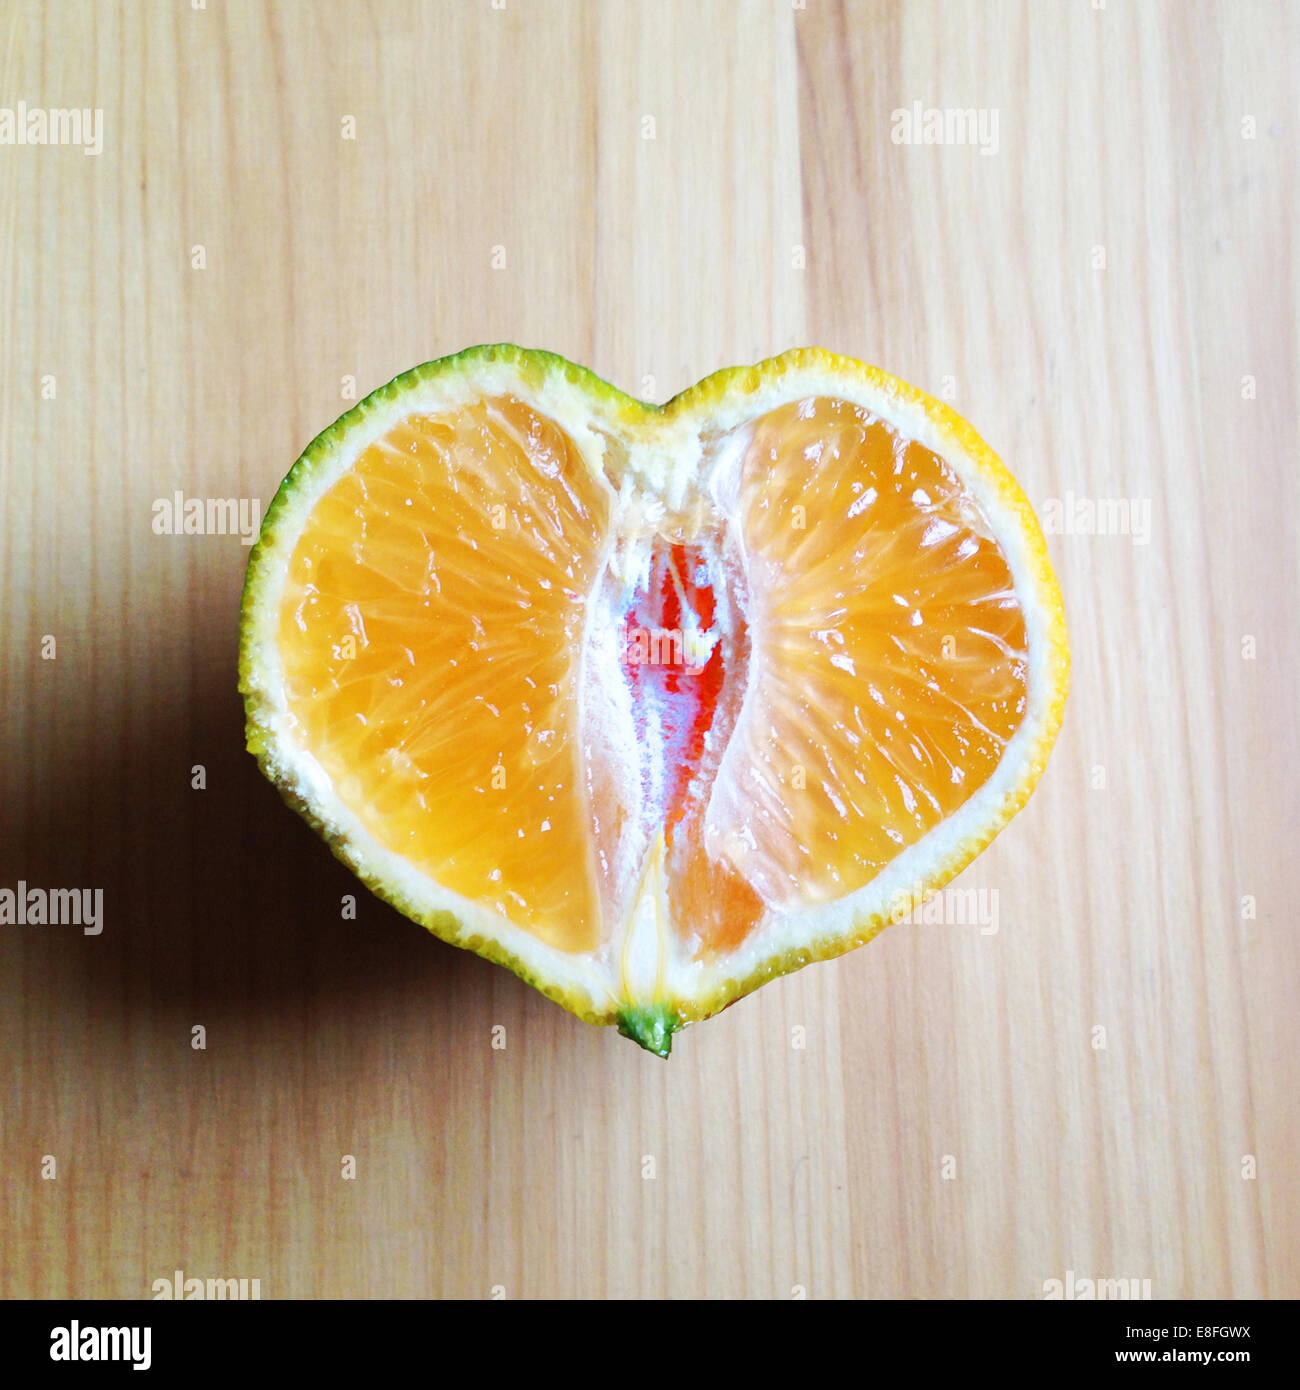 Heart shaped orange cut in half - Stock Image